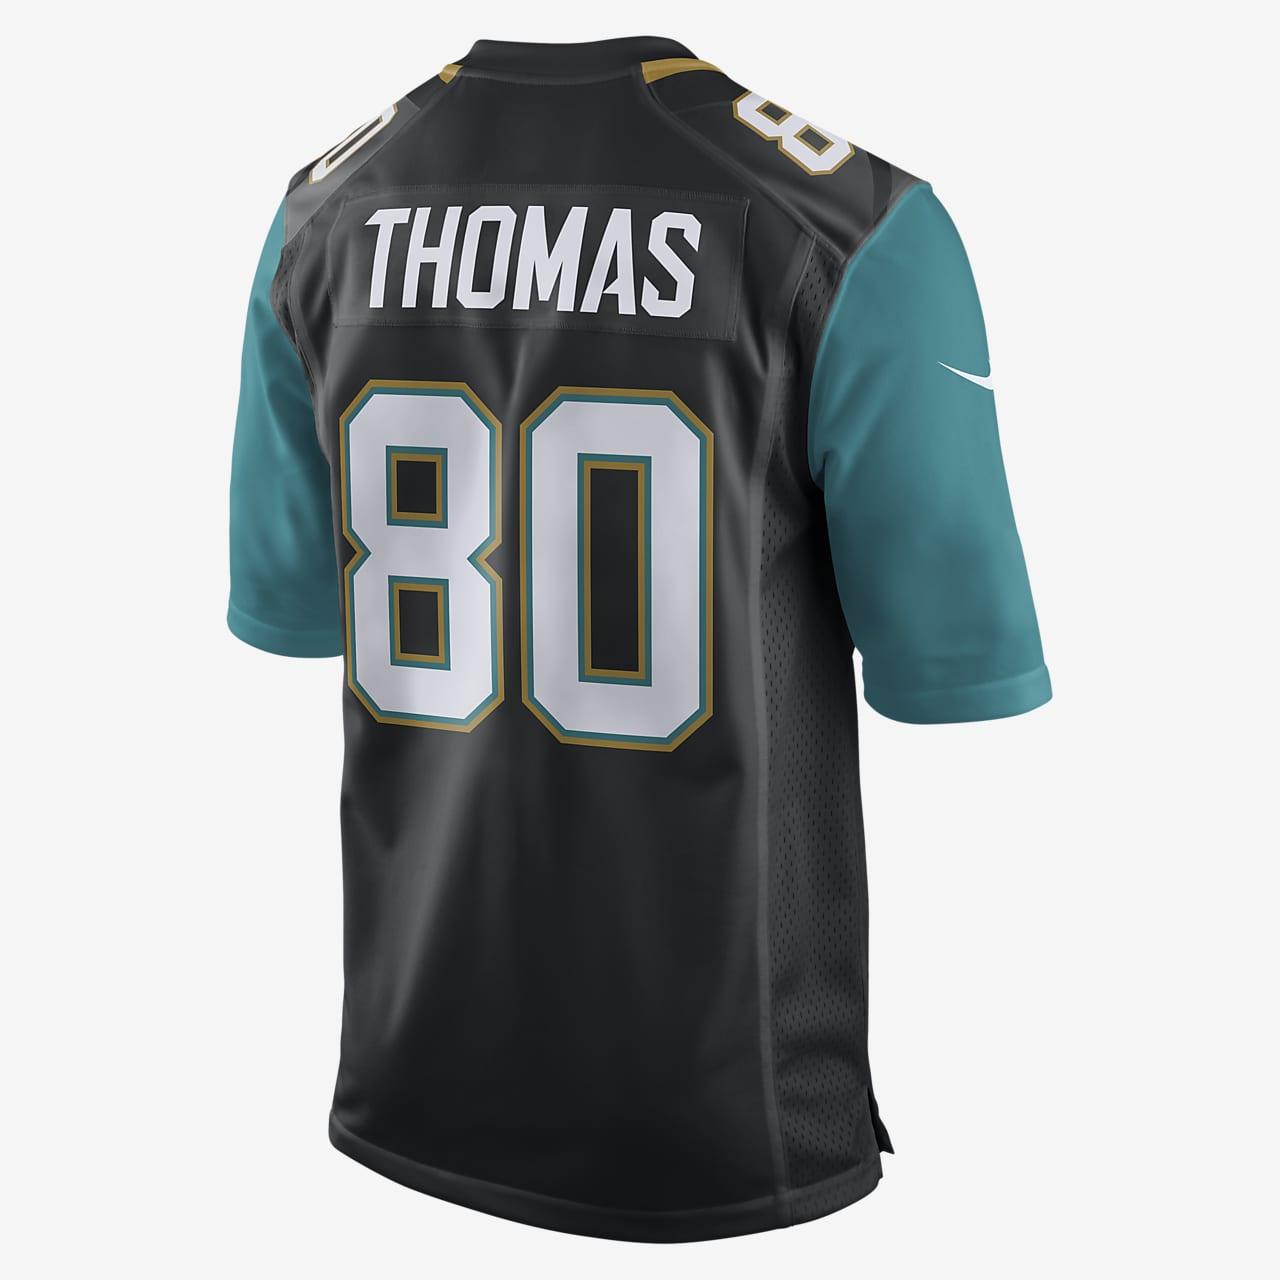 NFL Jacksonville Jaguars (Julius Thomas) Men's American Football Home Game Jersey